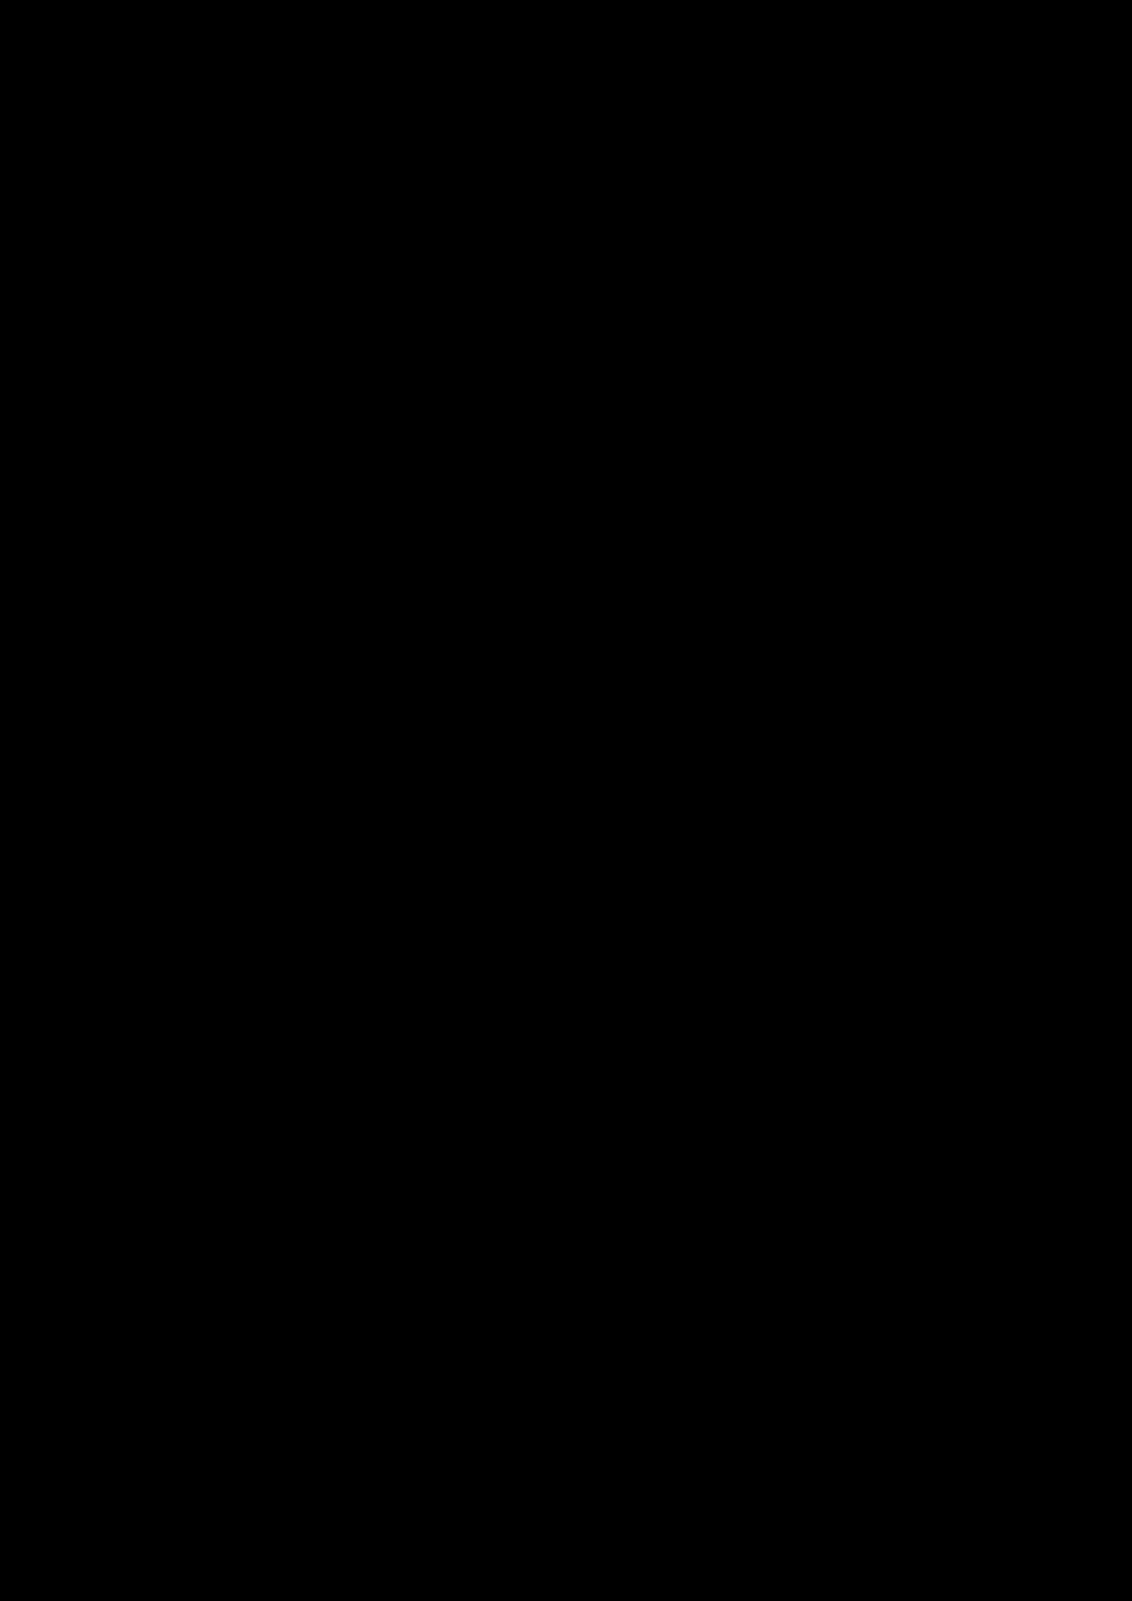 Ten lyubvi slide, Image 46